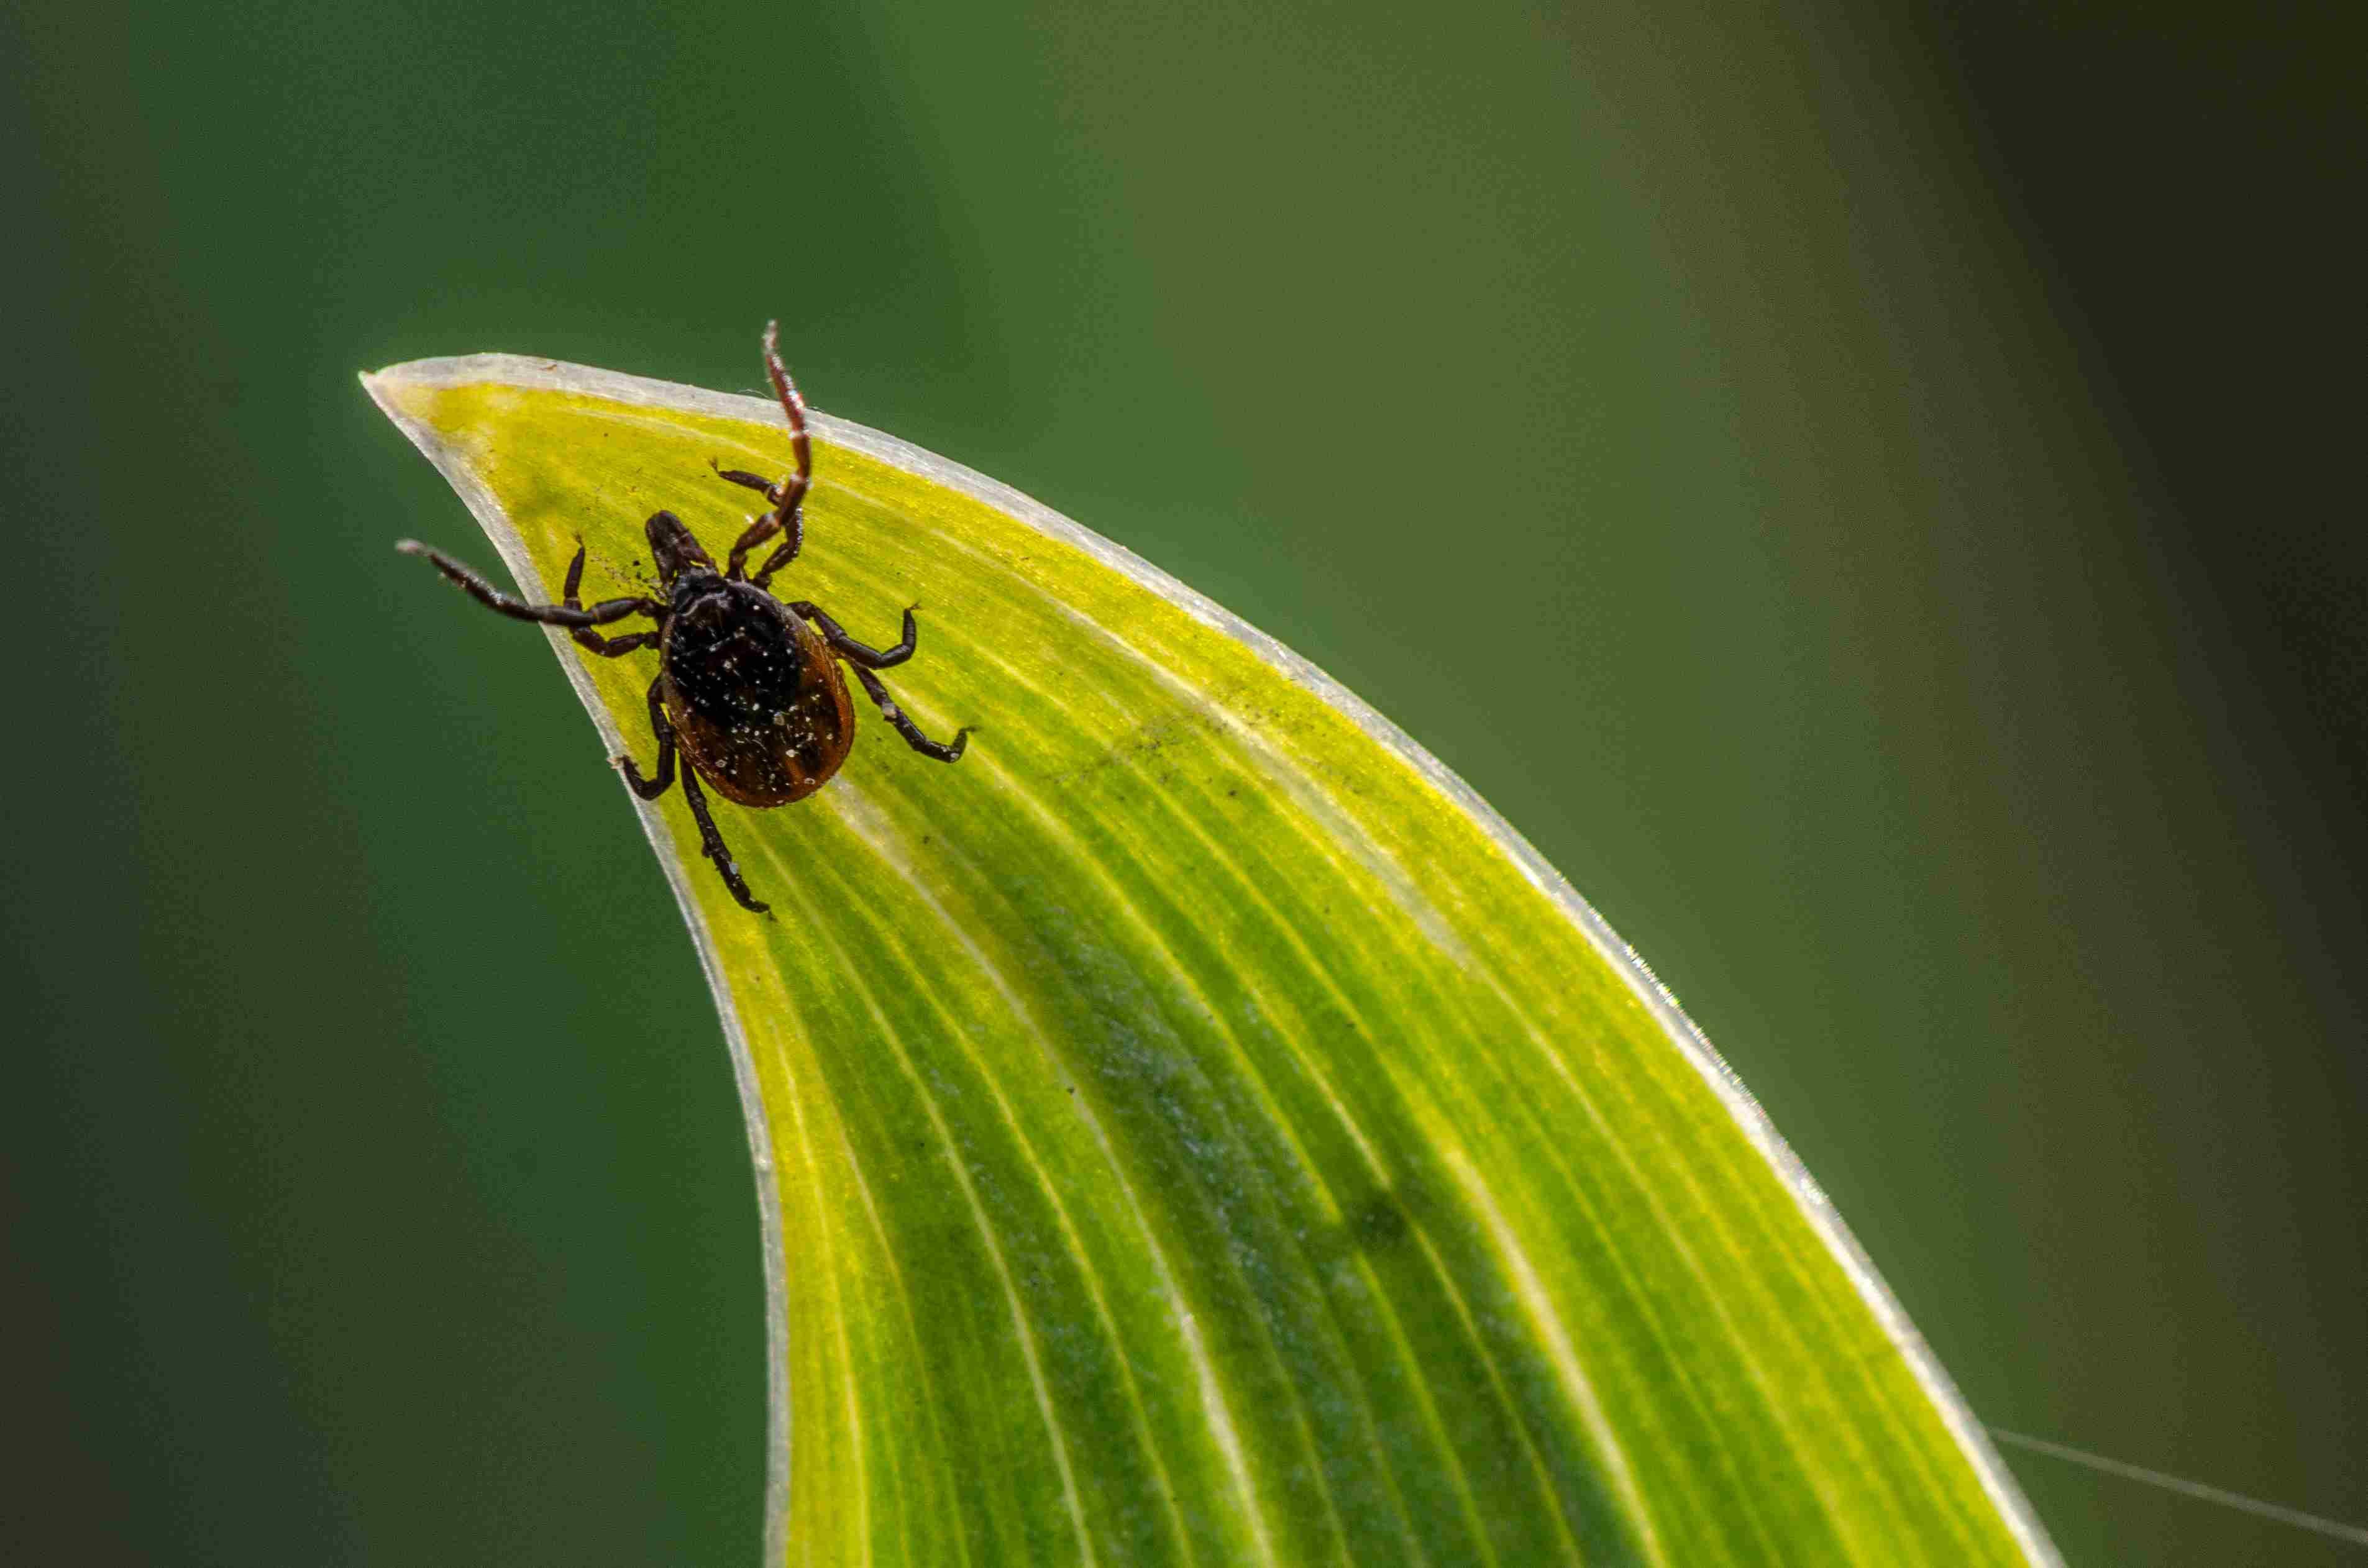 Tick in a garden